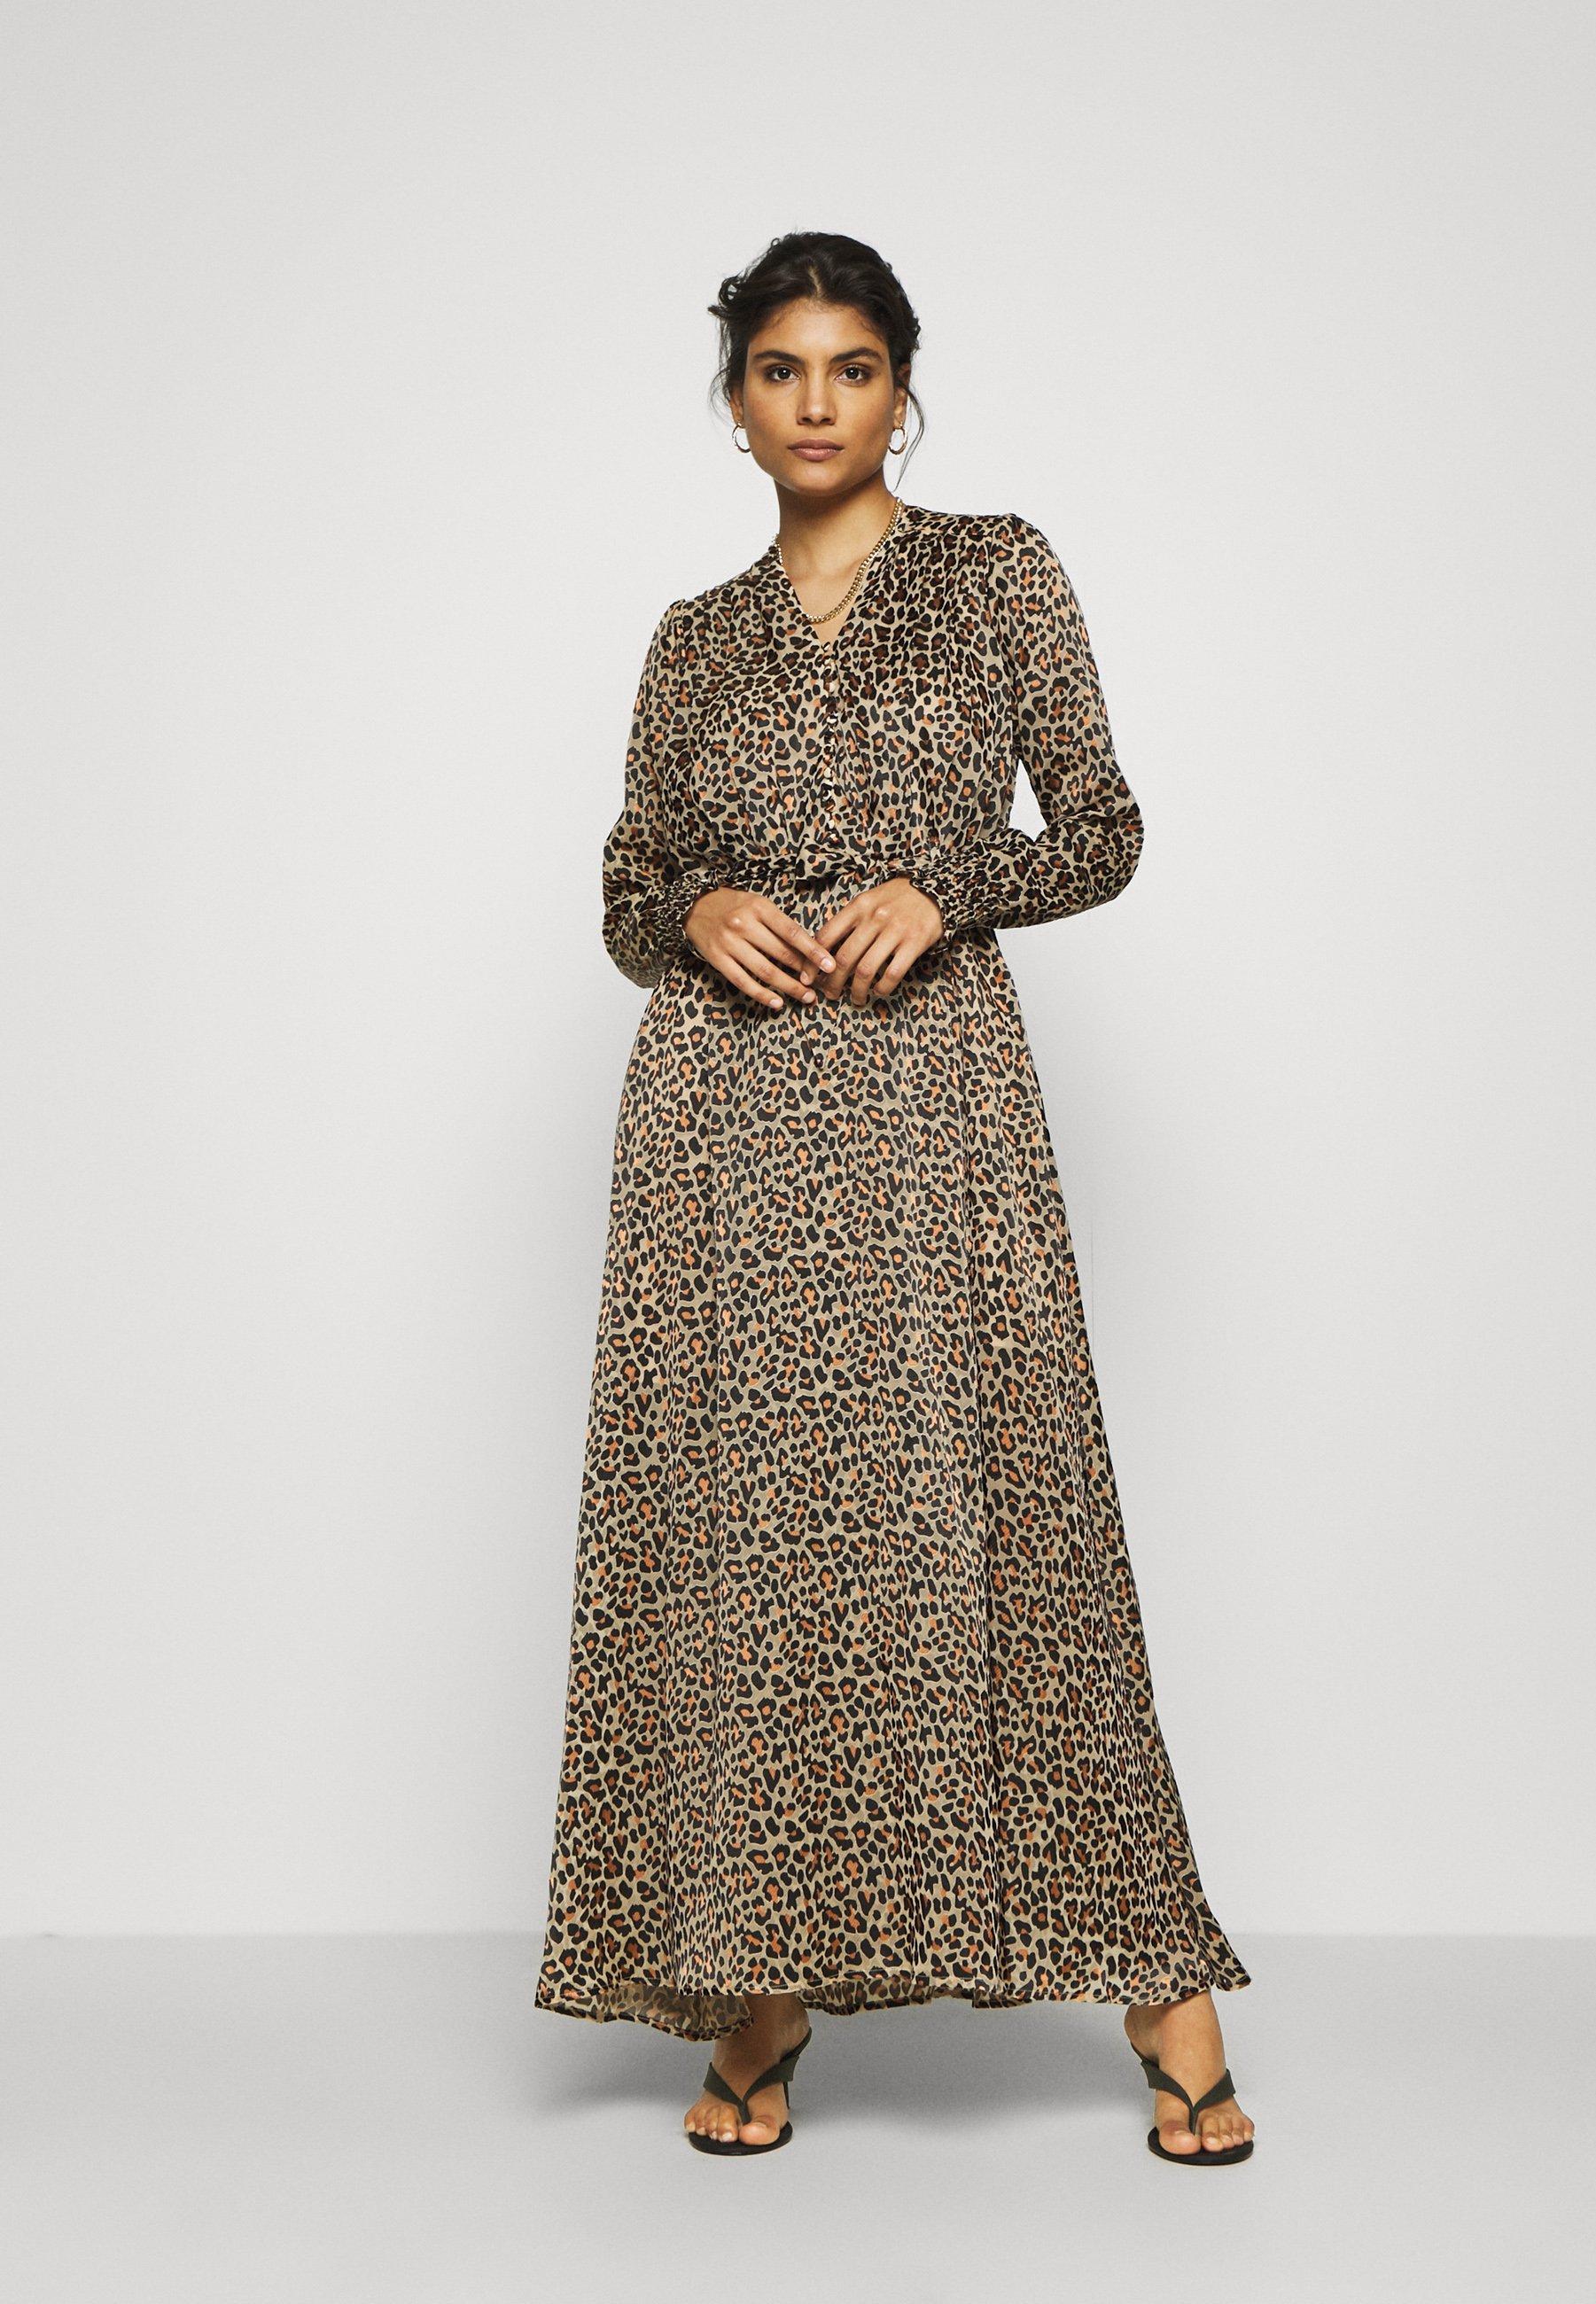 Factory Sale Women's Clothing Birgitte Herskind PAULA DRESS Maxi dress brown AN2agDW3T